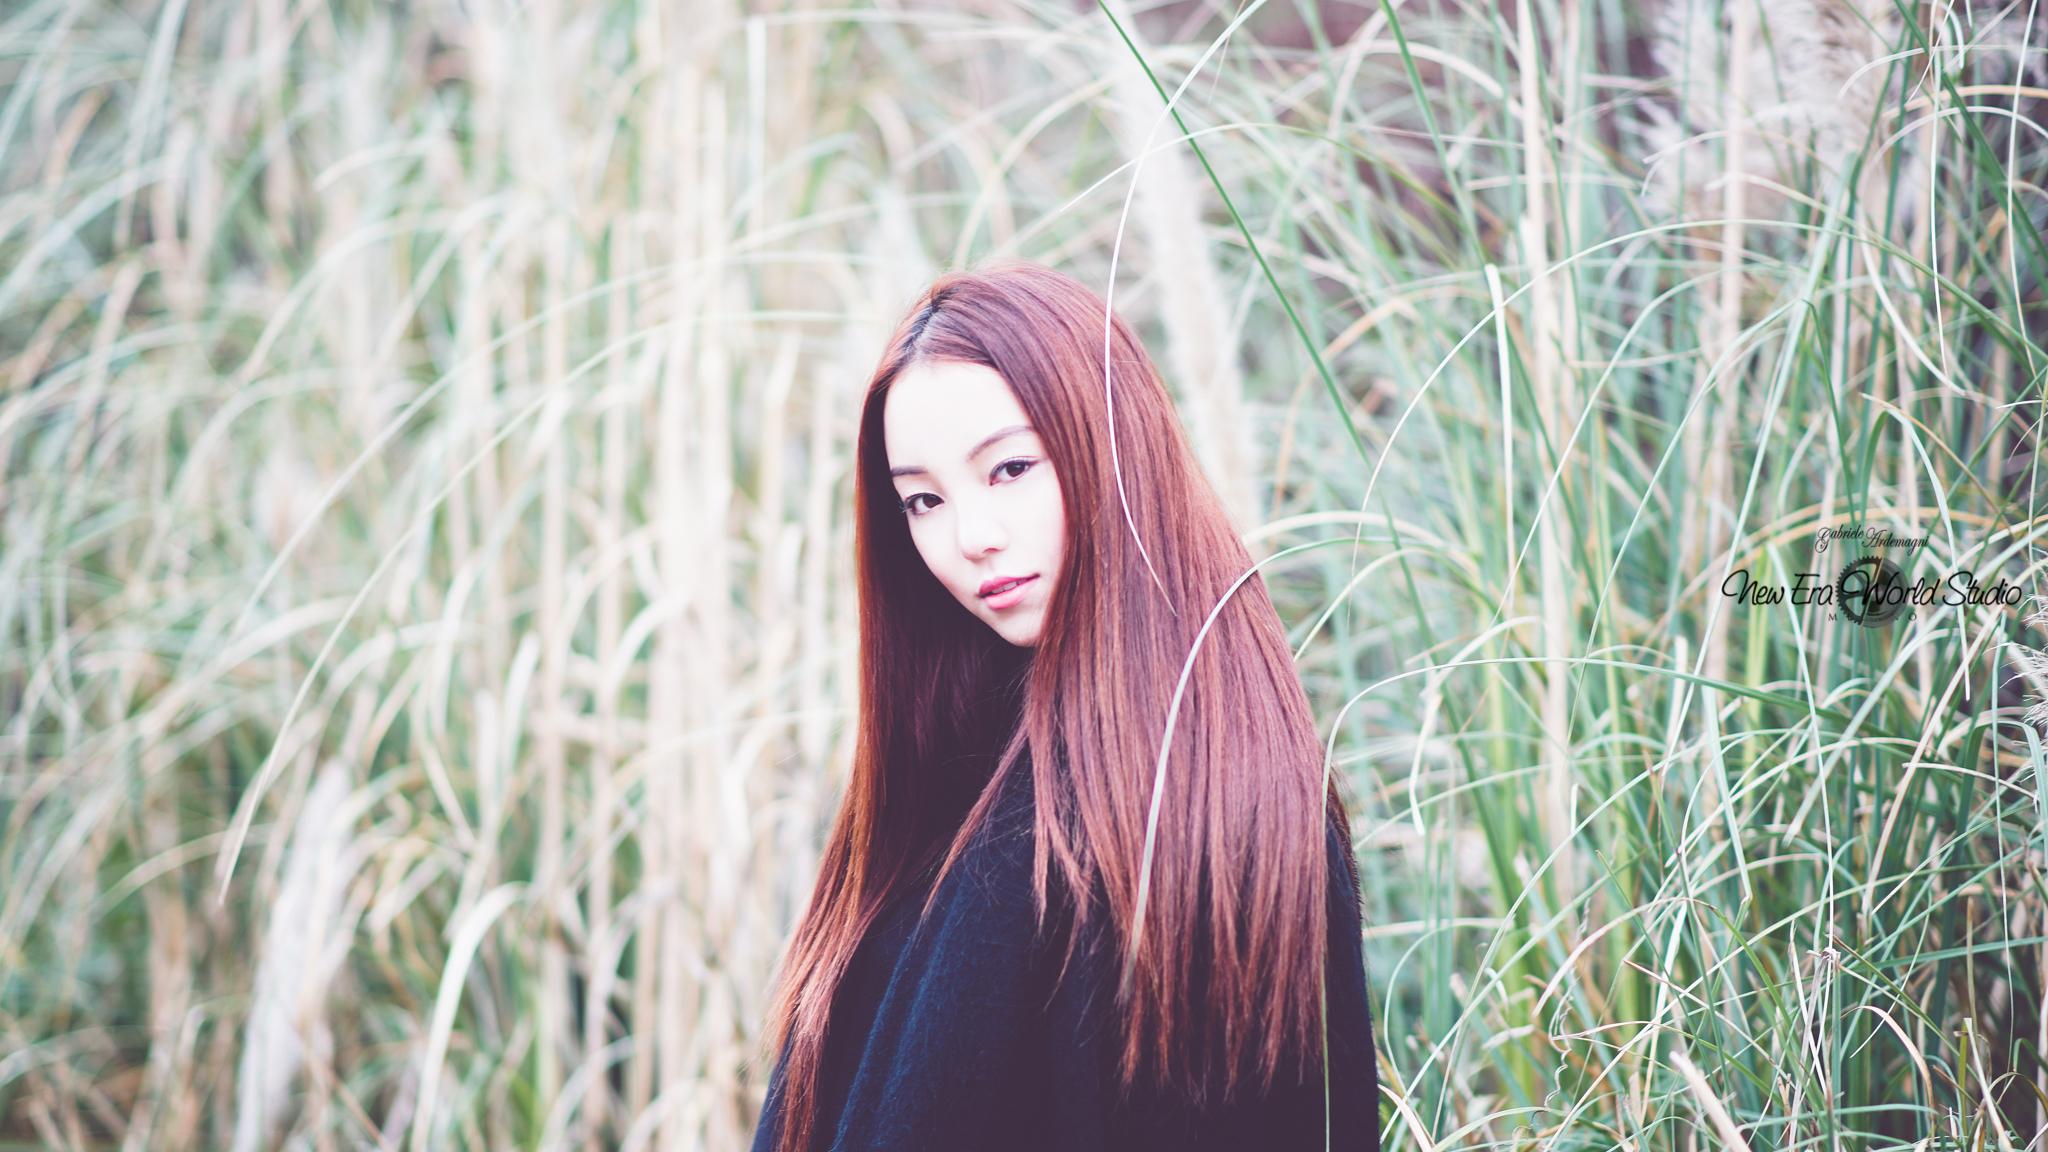 Giada Chen 1 foto www.gabrieleardemagni.com